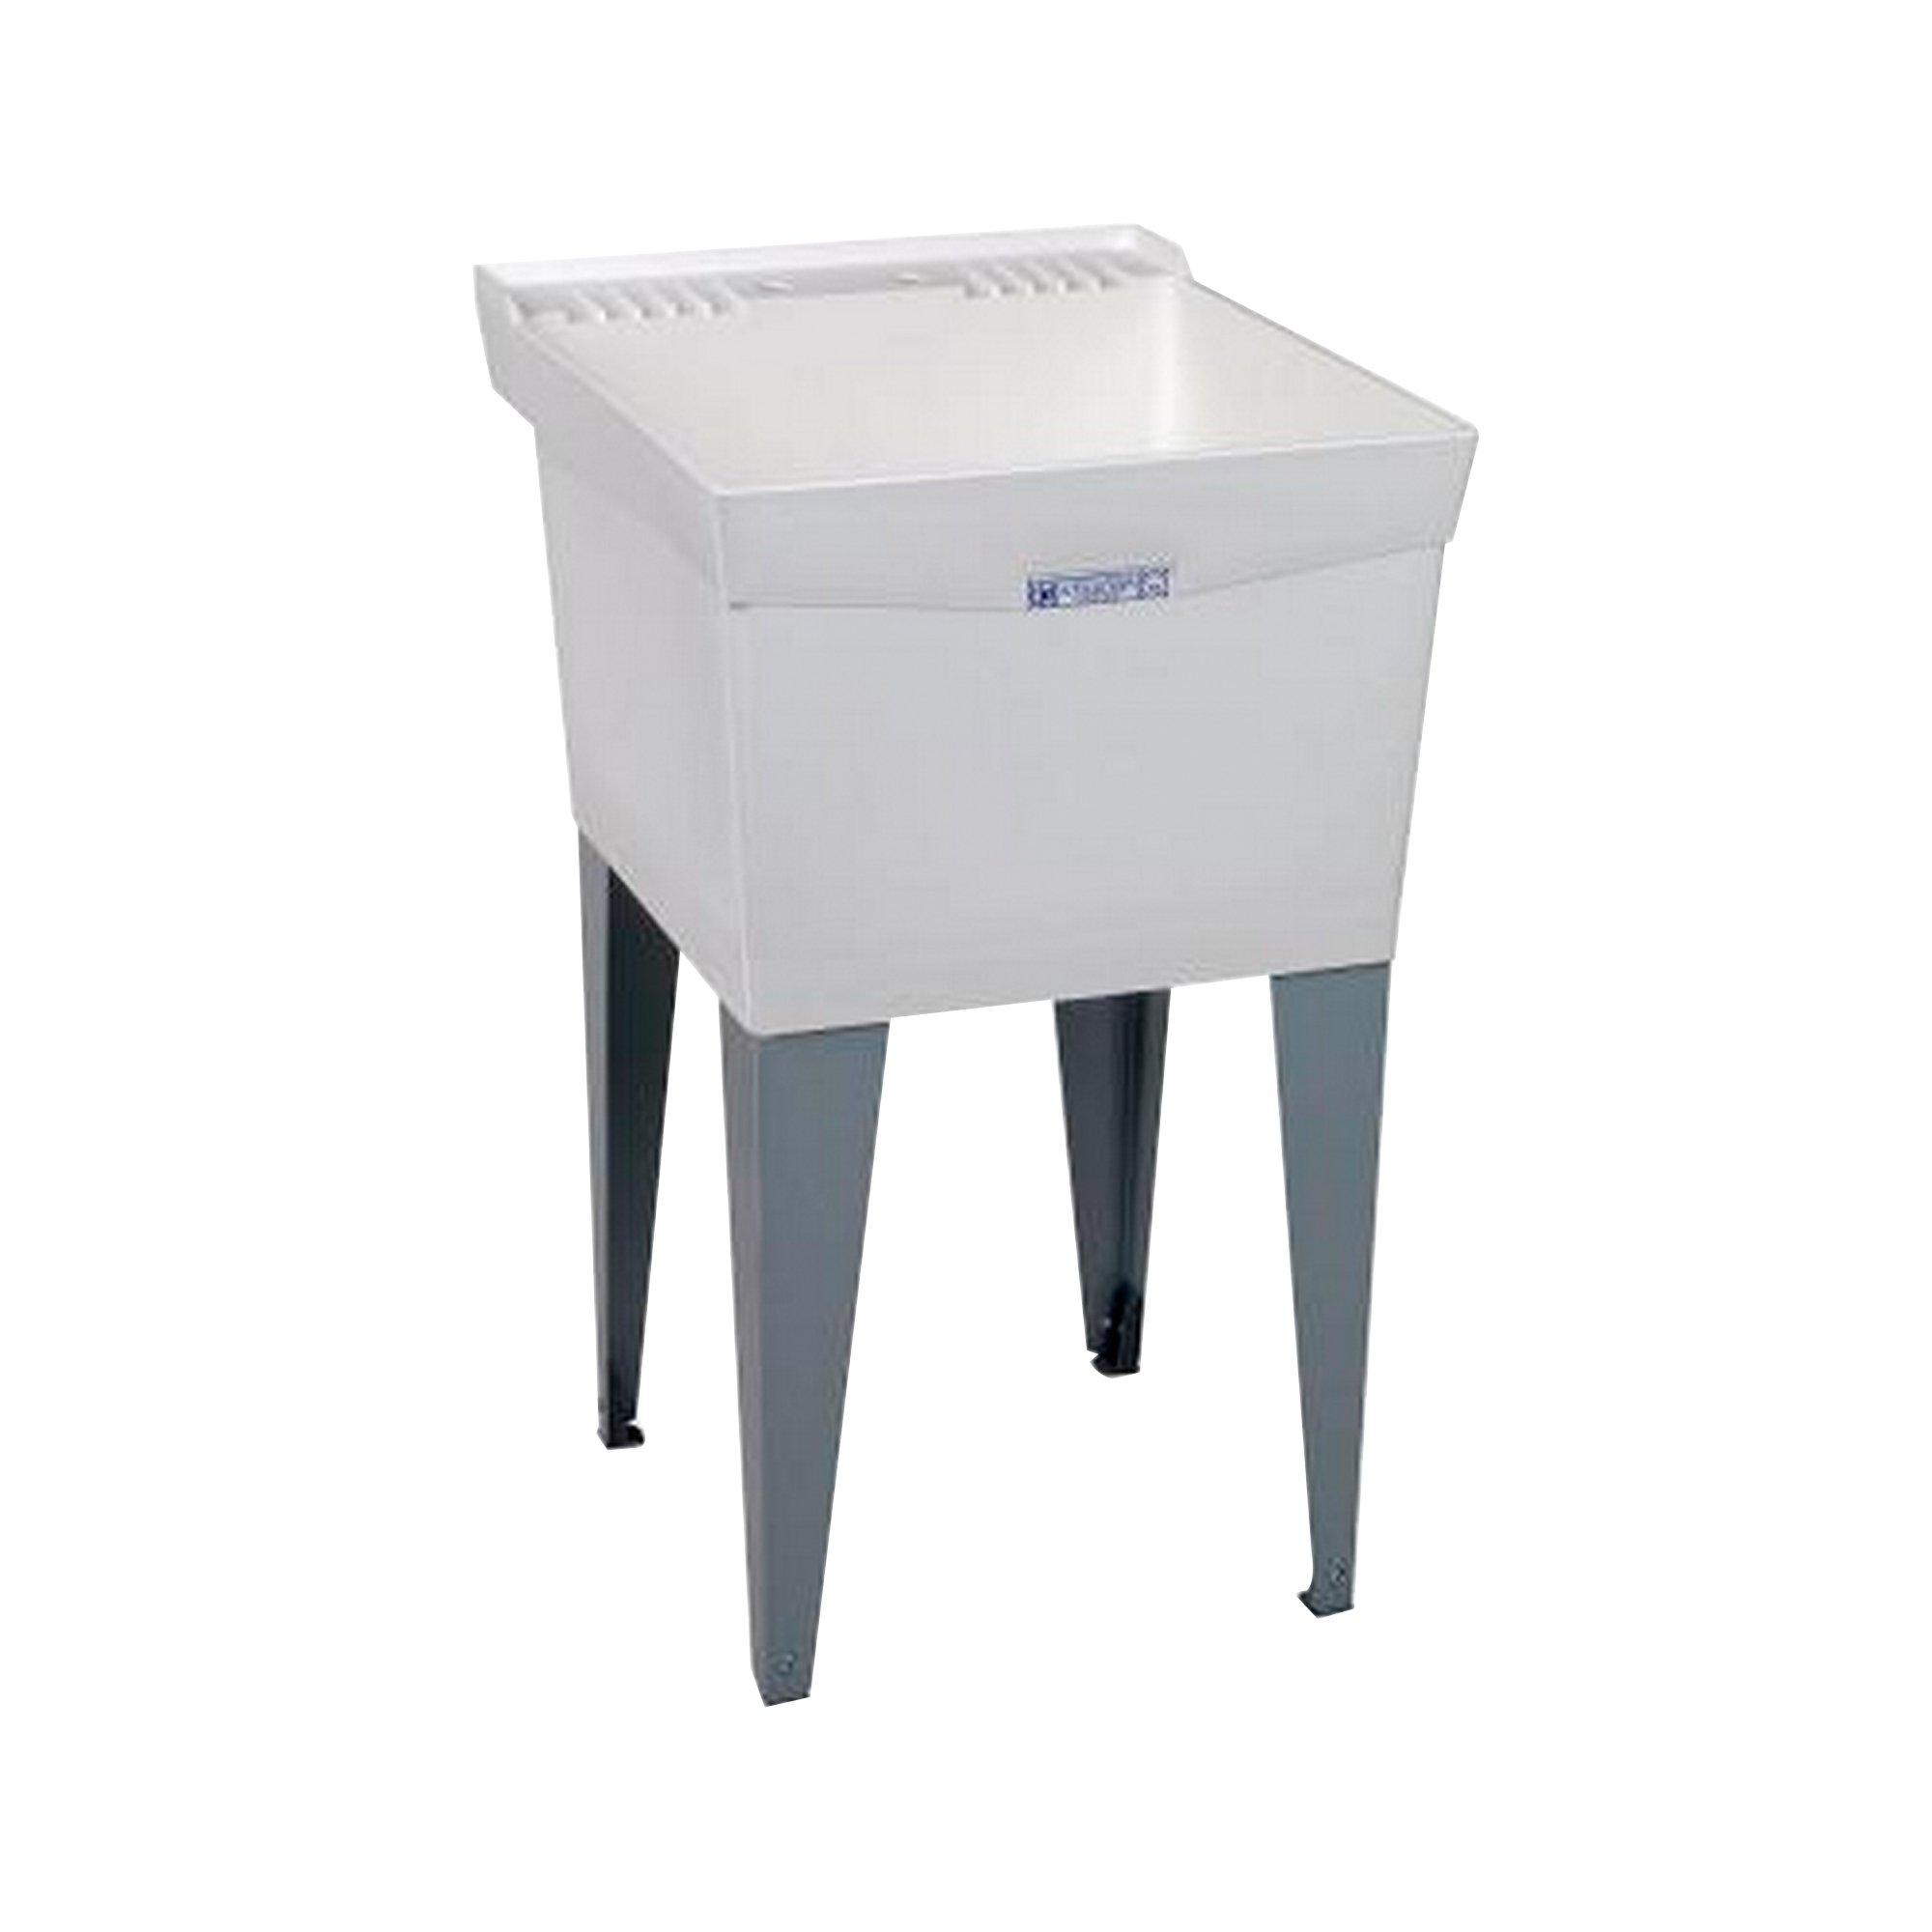 Mustee 19F Utilatub Laundry Tub Floor Mount, 24-Inch x 20-Inch, White